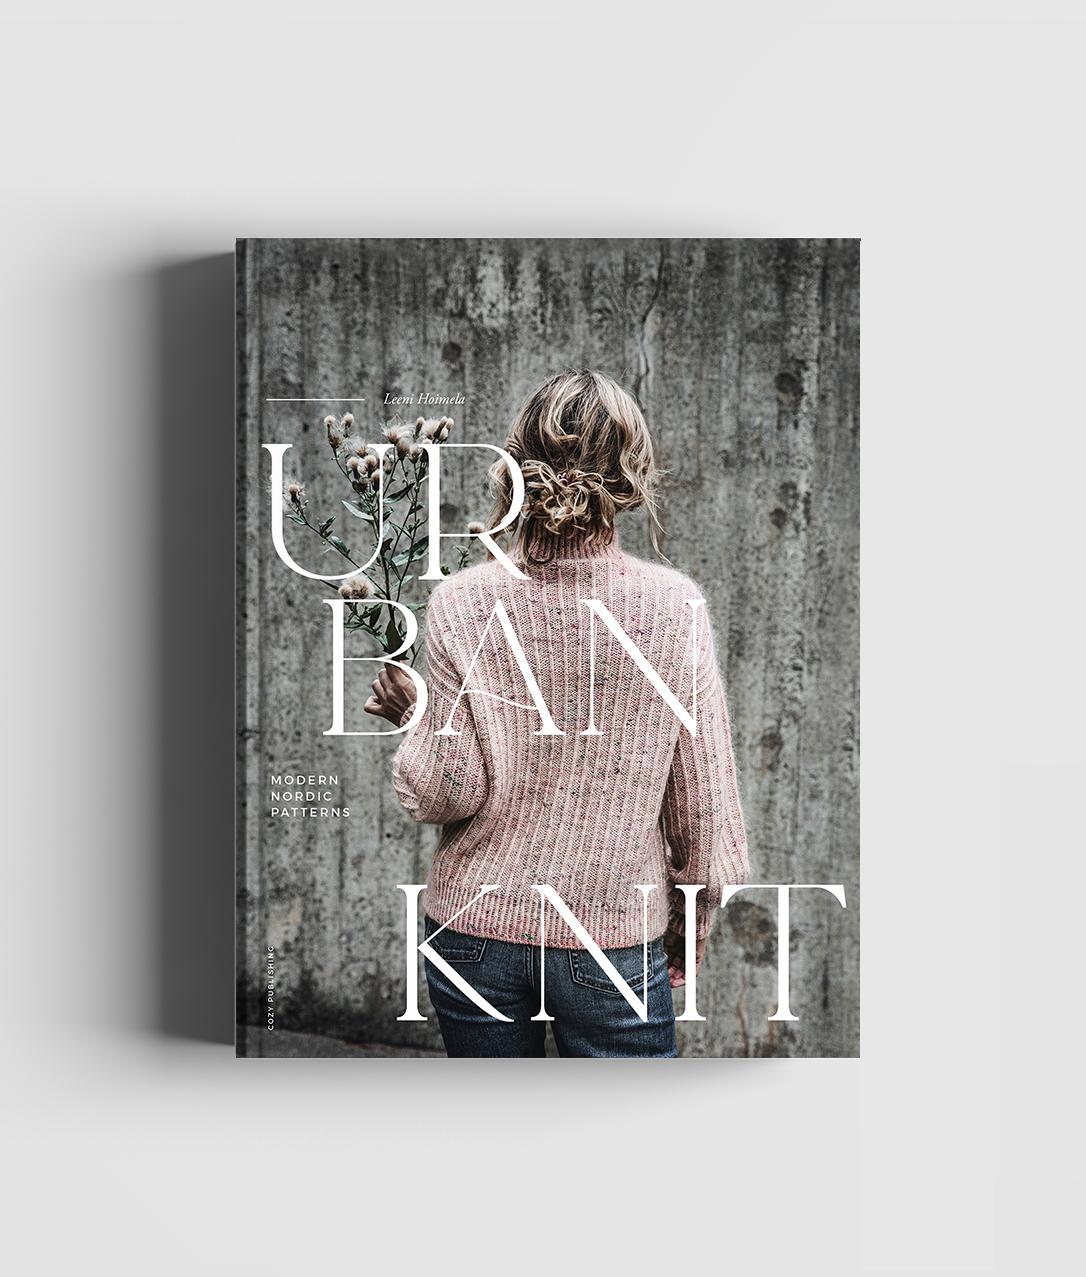 Urban Knit - Modern Nordic Patterns, englanti